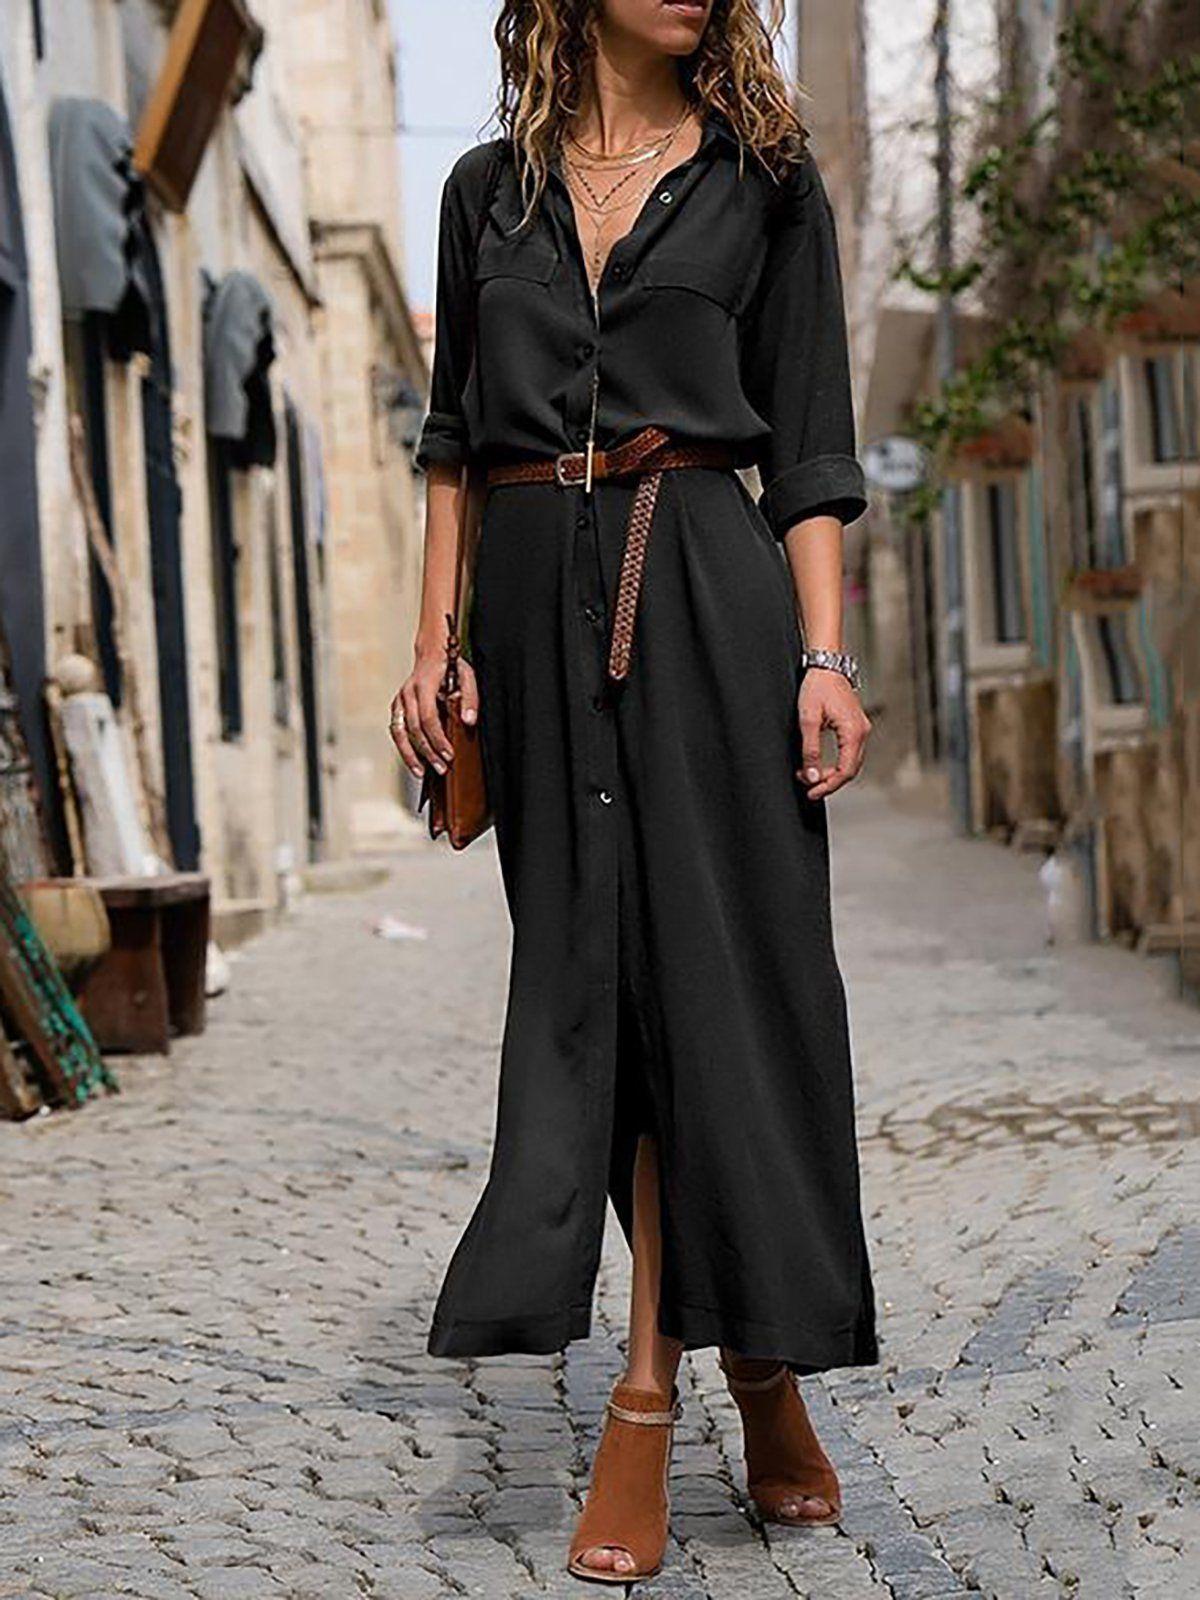 Woman Elegant Long Dress Casual 3 4 Sleeve Shawl Collar Casual Dress Black 3xl In 2021 Maxi Dress With Sleeves Long Sleeve Maxi Dress Fashion Clothes Women [ 1600 x 1200 Pixel ]